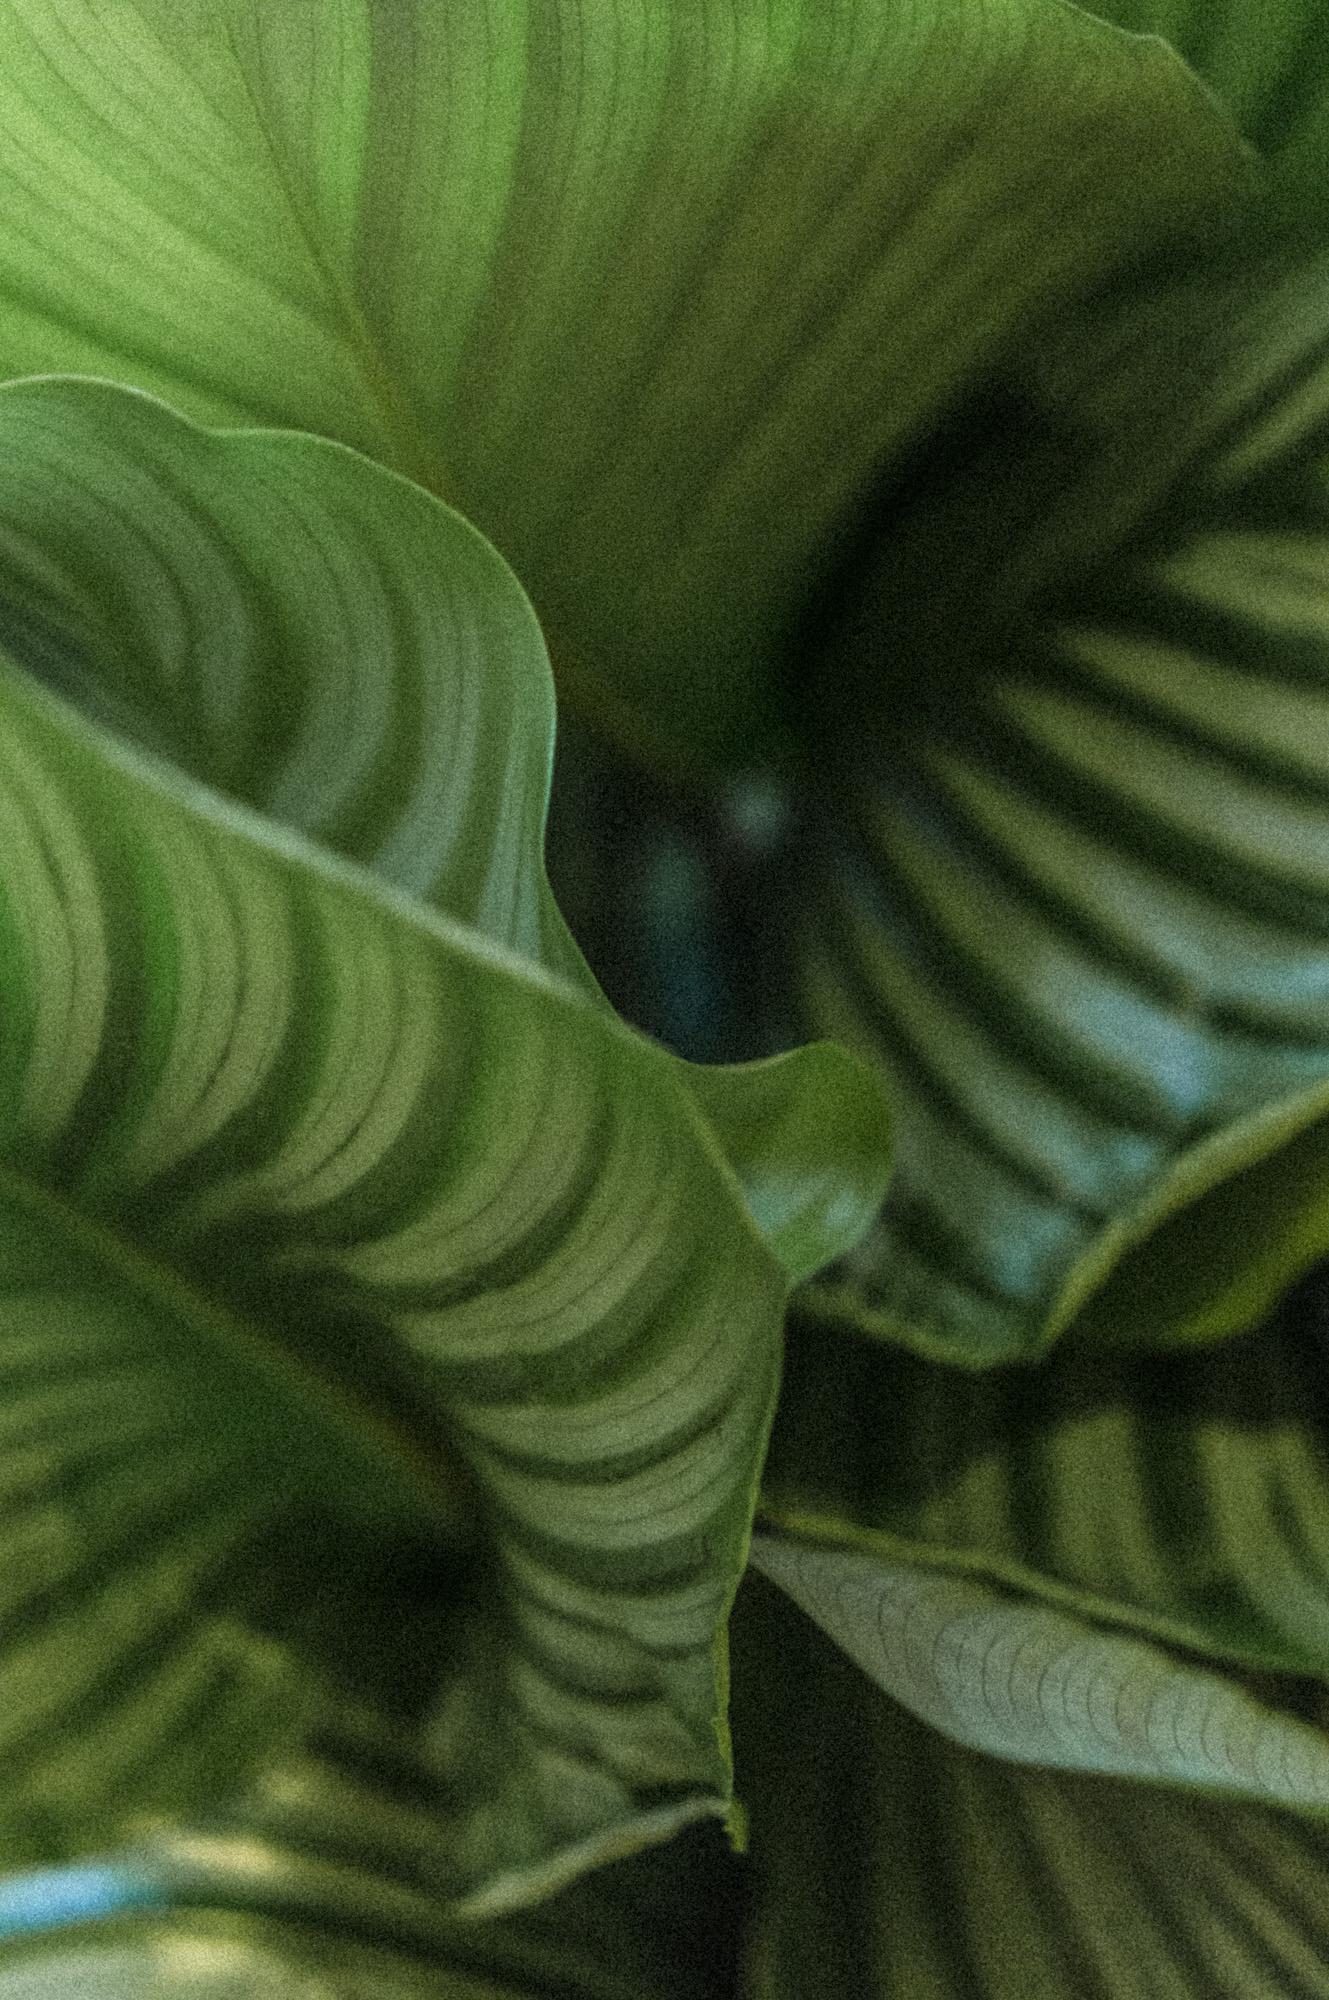 plantemagasinet gro Calatheaorbifolia ragnhild solem vikra